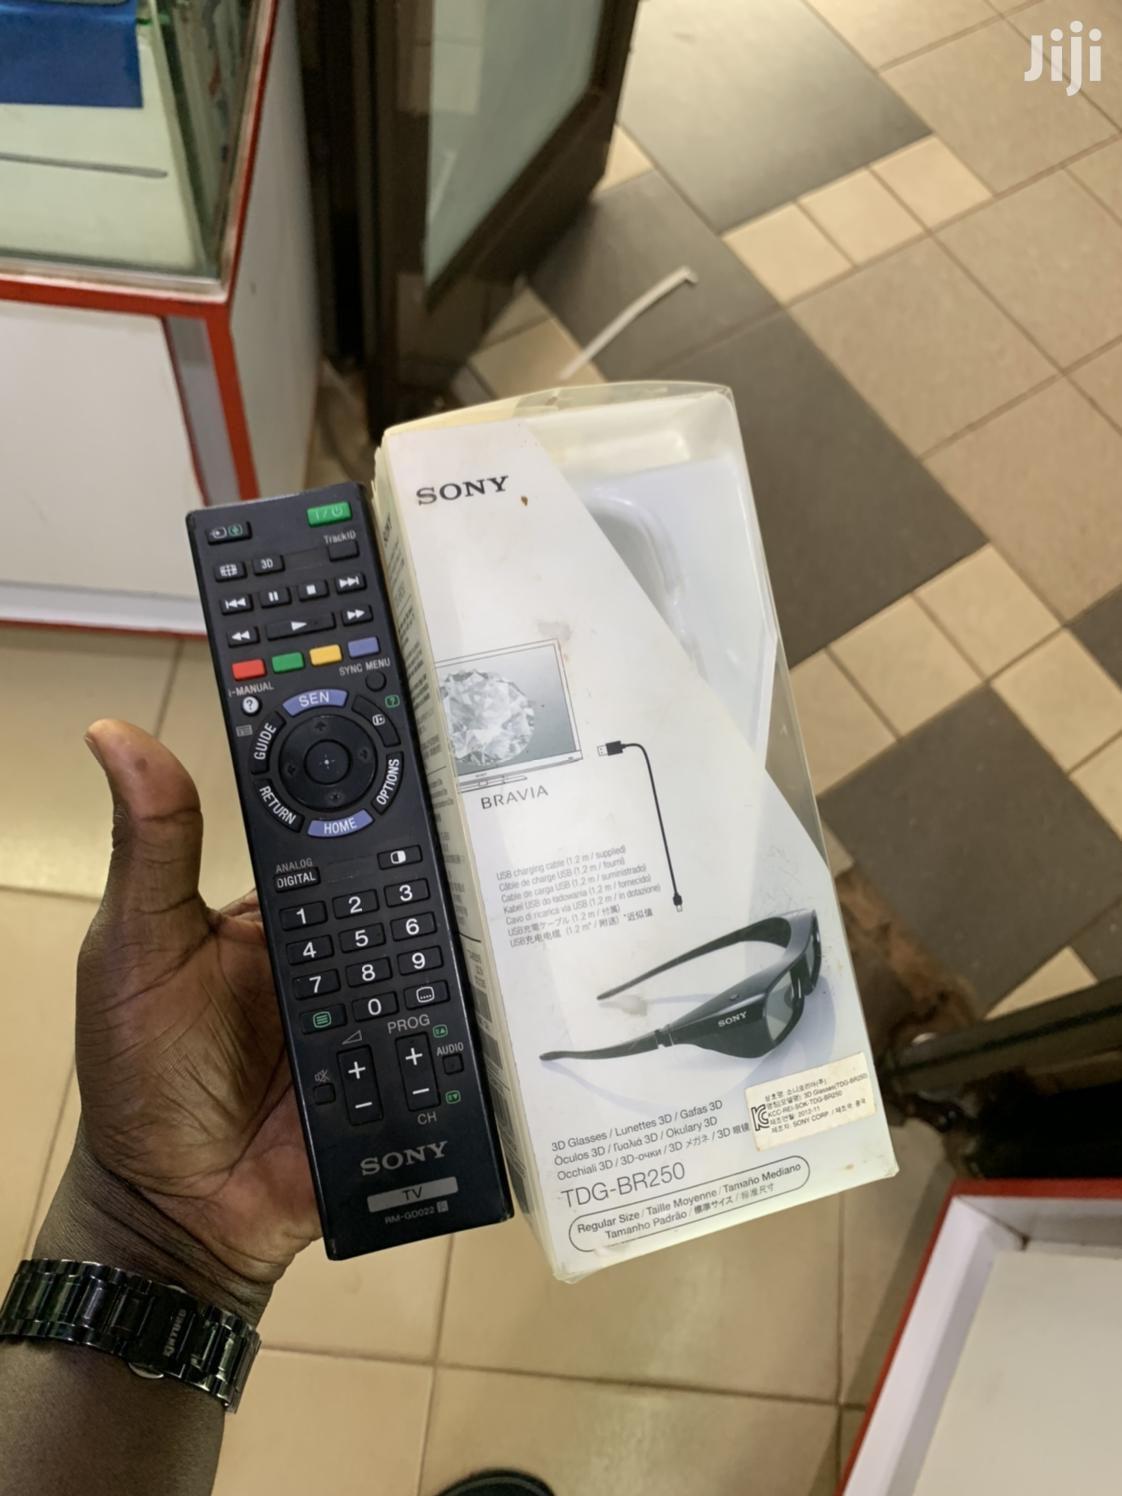 Sony Bravia 3D Smart TV 46 Inches Uk Used | TV & DVD Equipment for sale in Kampala, Central Region, Uganda